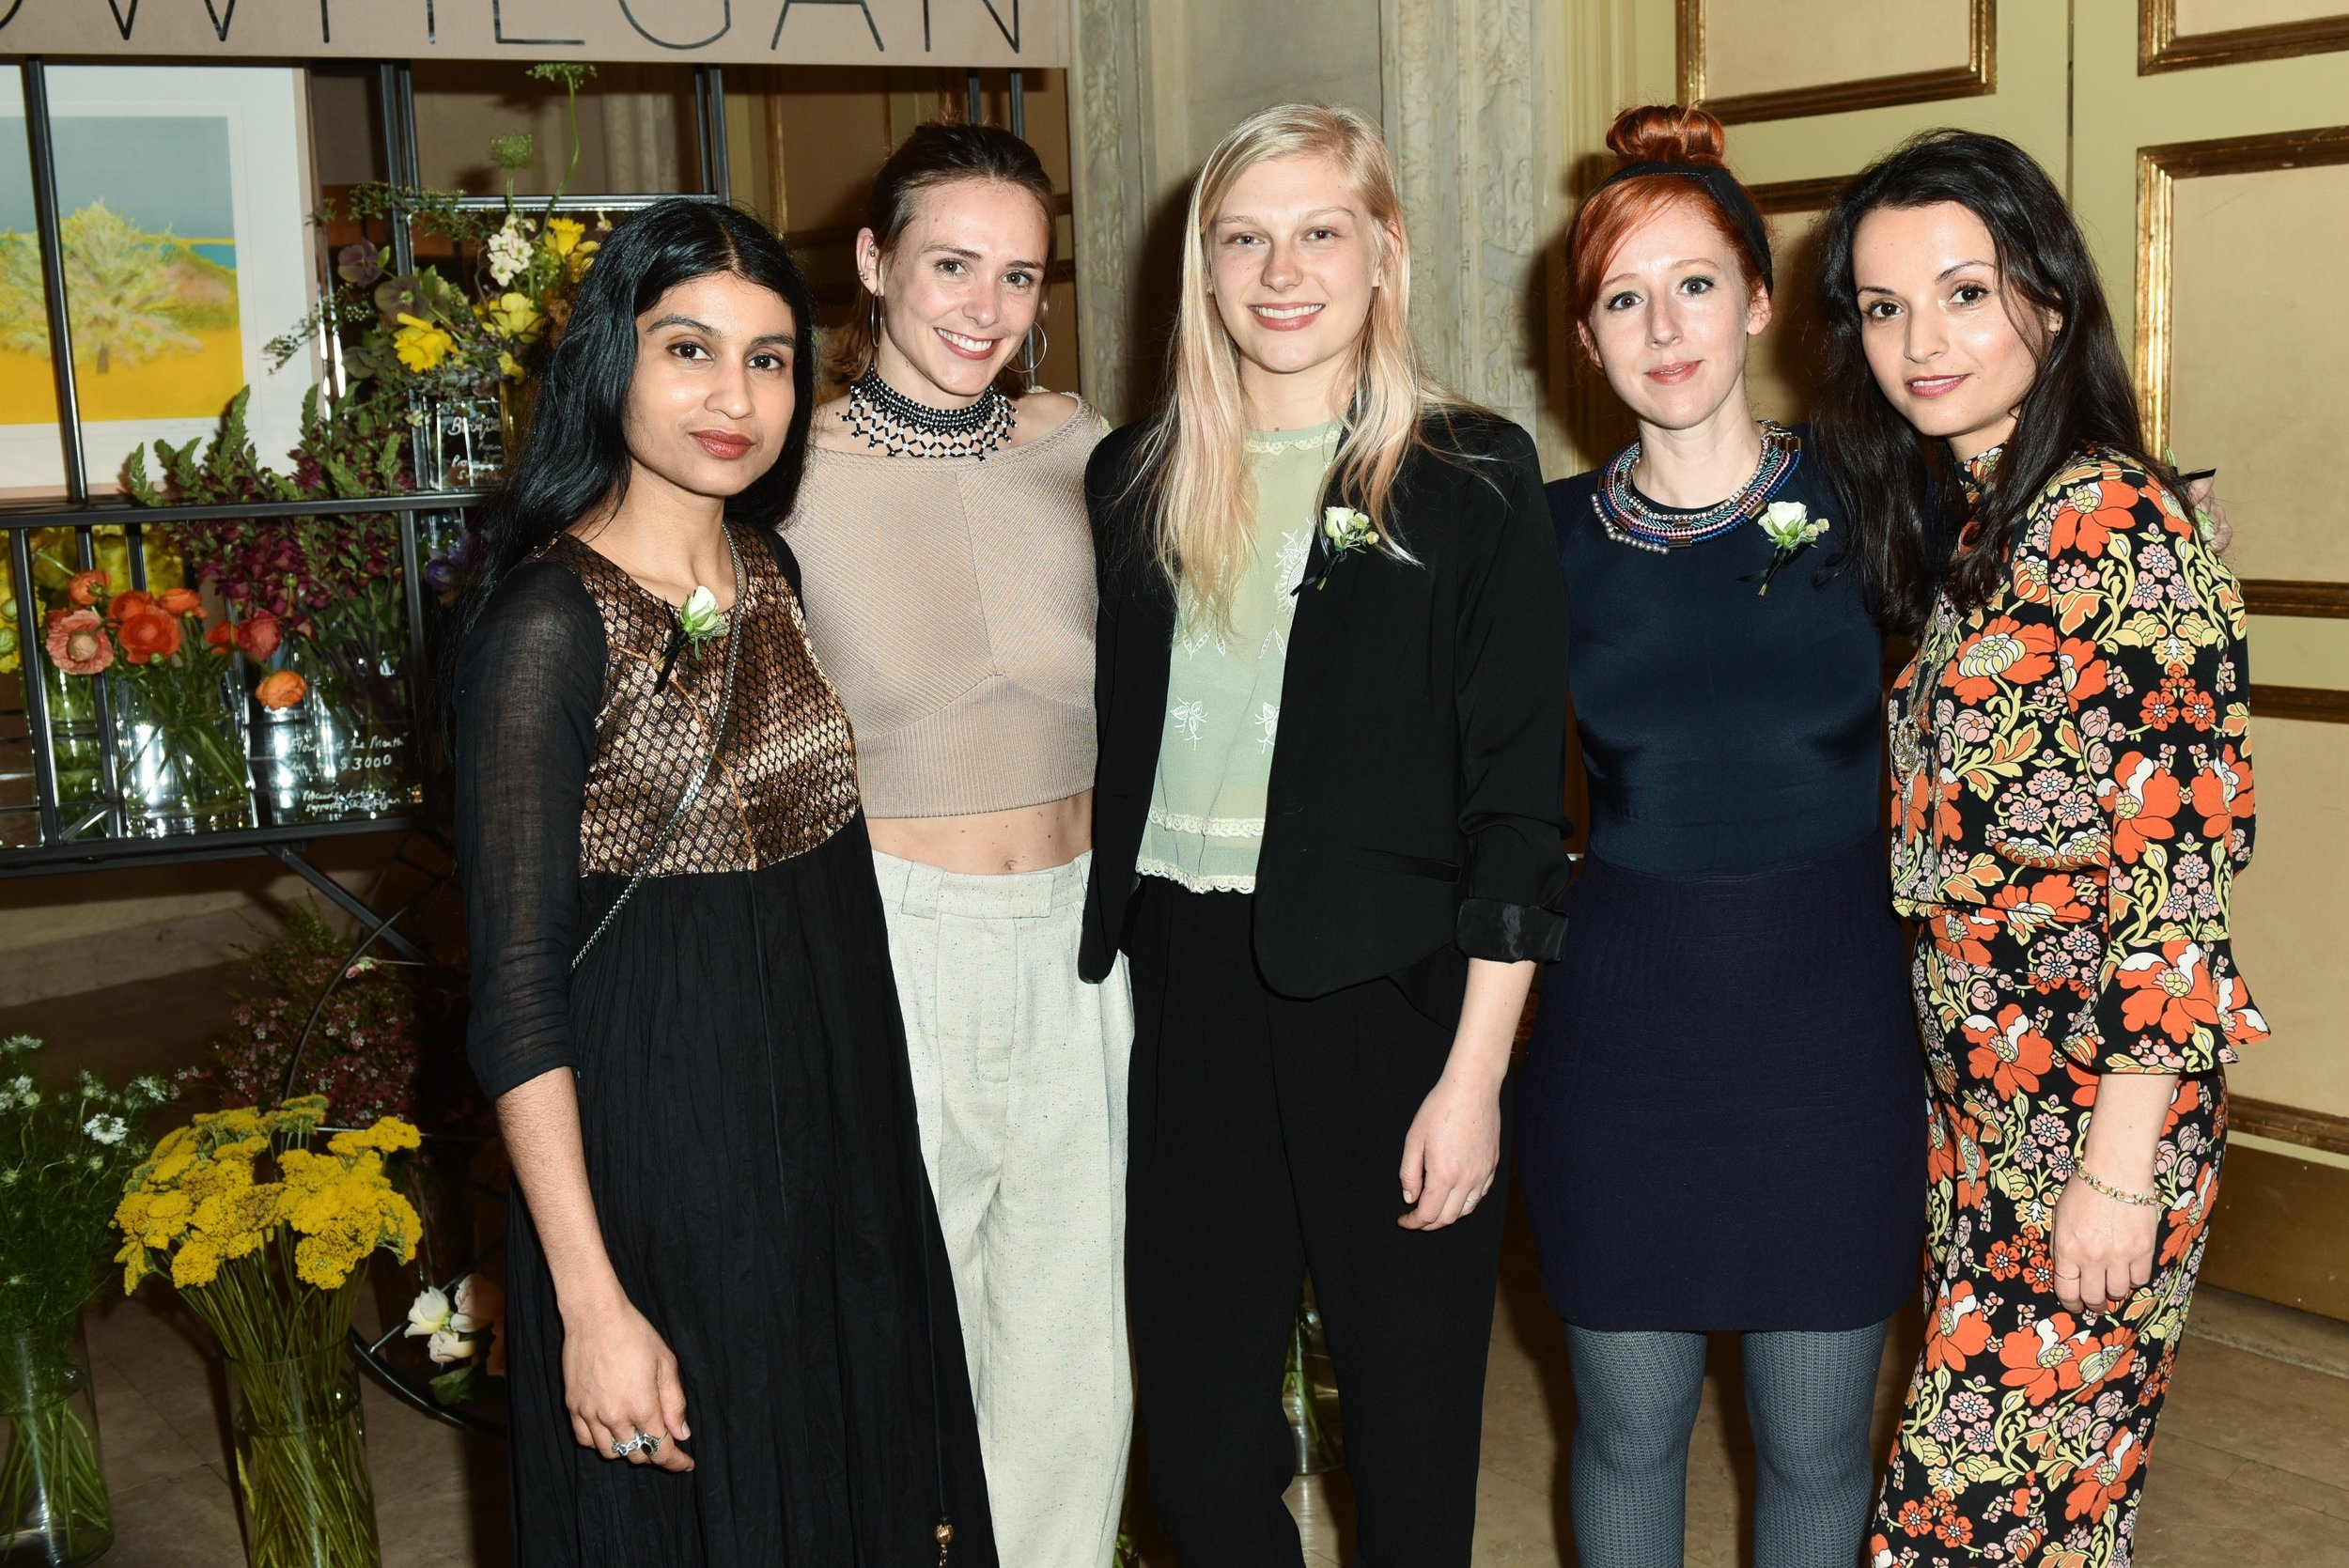 Baseera Khan, Jamie McCuaig, Rosie Dooley, Clare Torina, Irini Miga